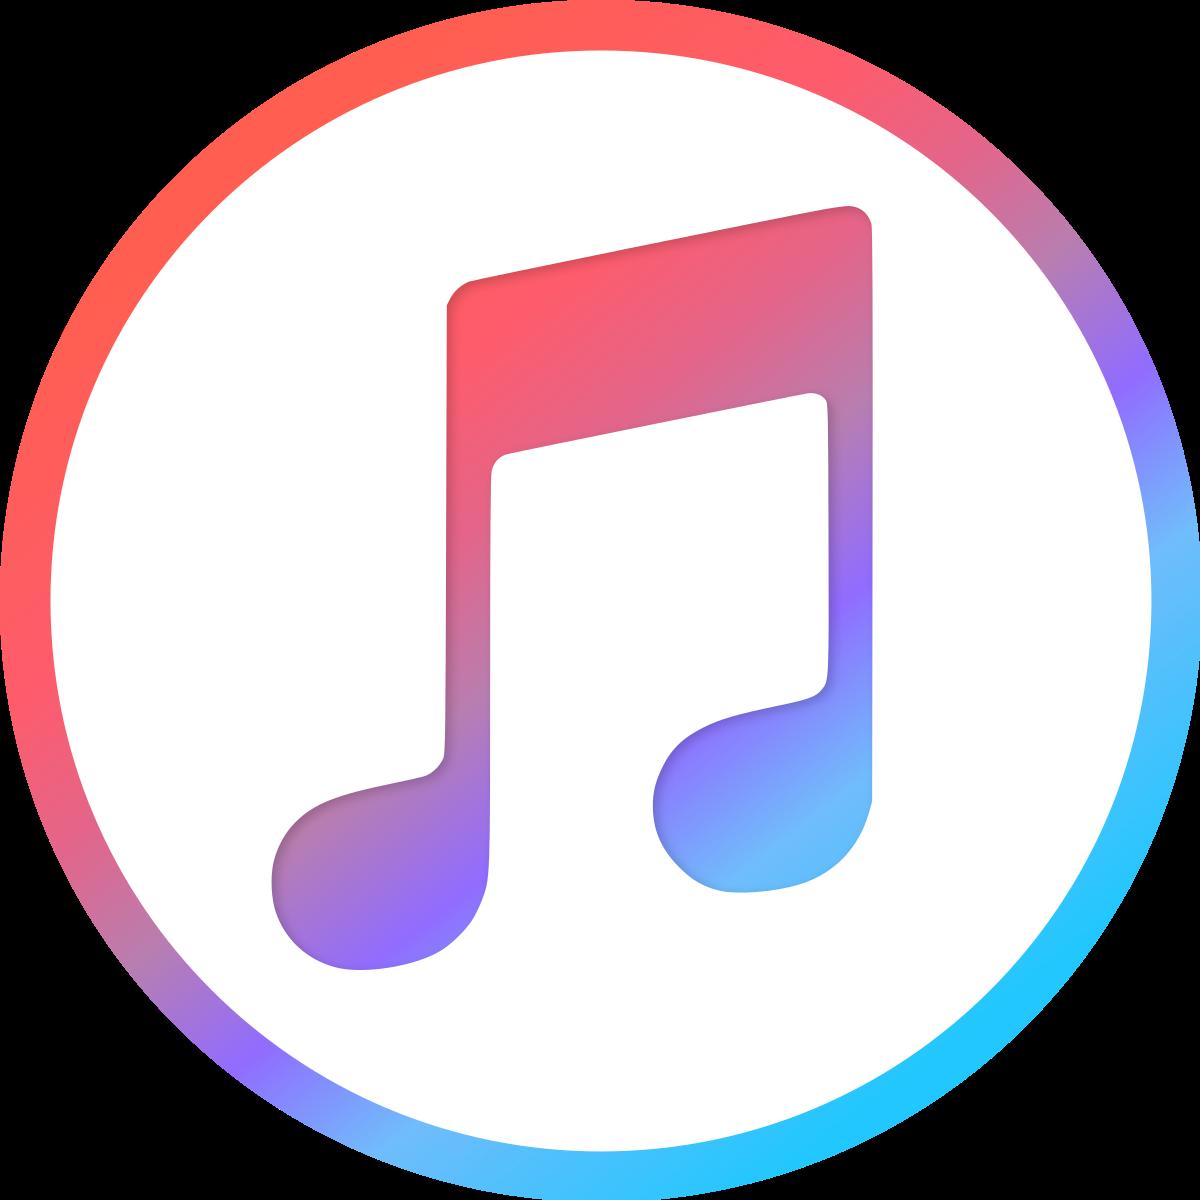 Itunes wikipedia . Clipart music music room